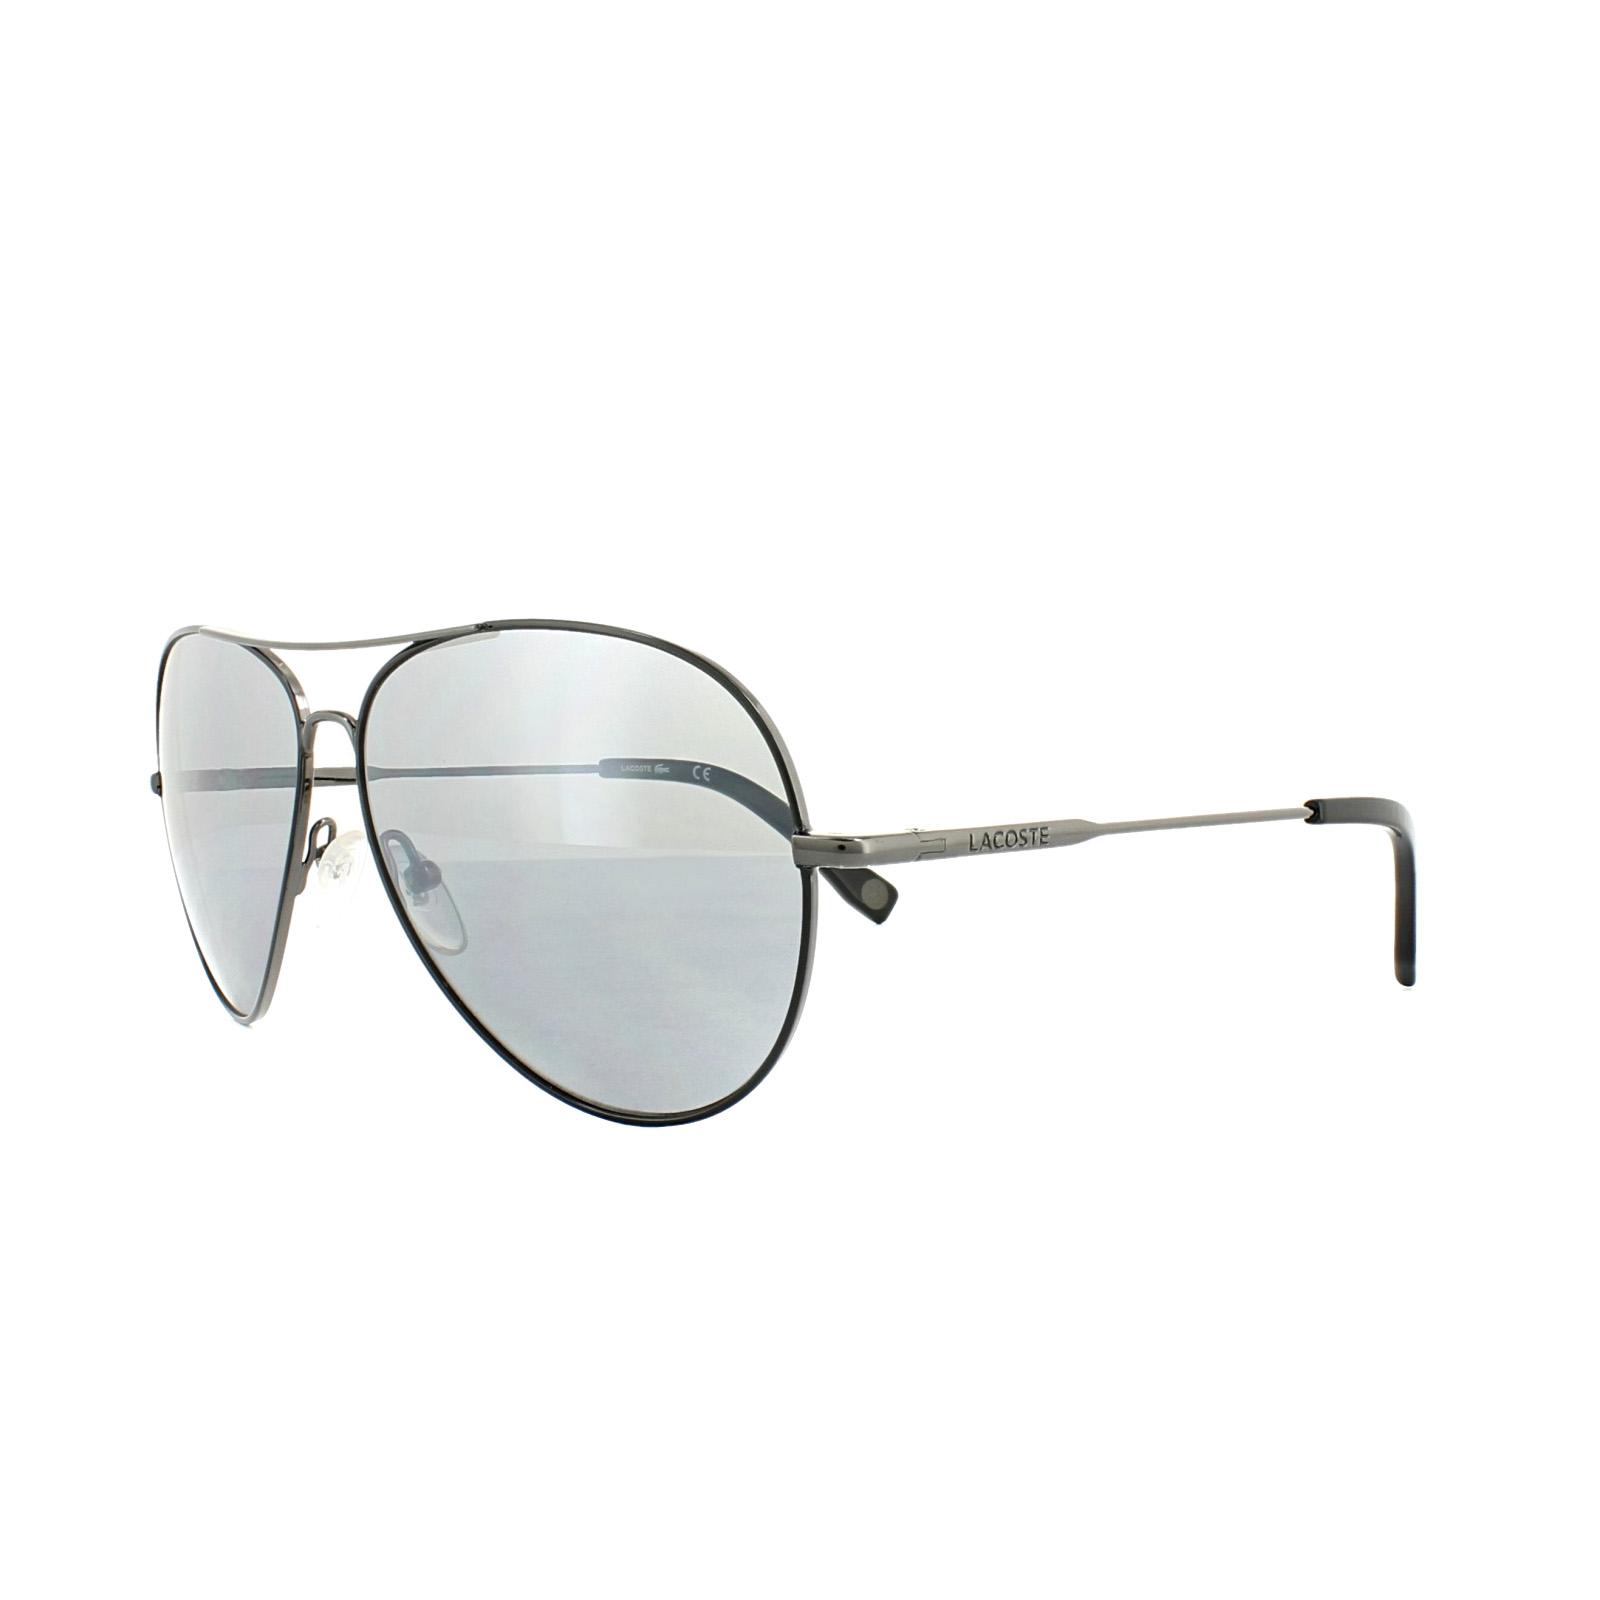 7159d414e1a2 Sentinel Lacoste Sunglasses L174S 033 Gunmetal Grey Grey. Sentinel  Thumbnail 2